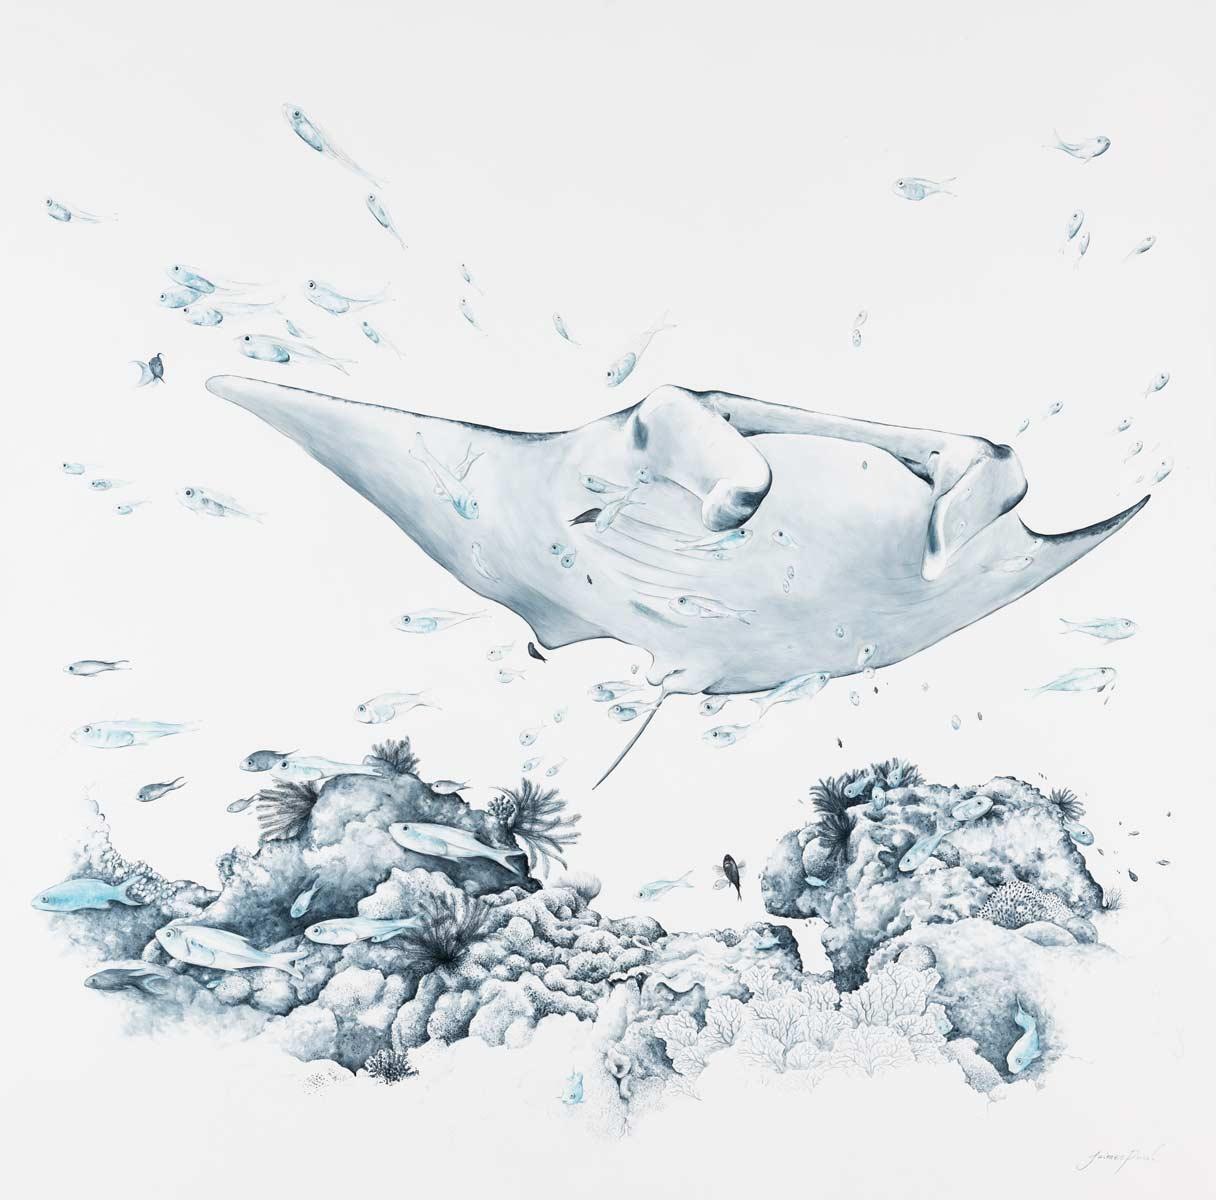 Jaimee-Paul_Abundance_123x123_Watercolour-on-canvas_3200_LowRes.jpg